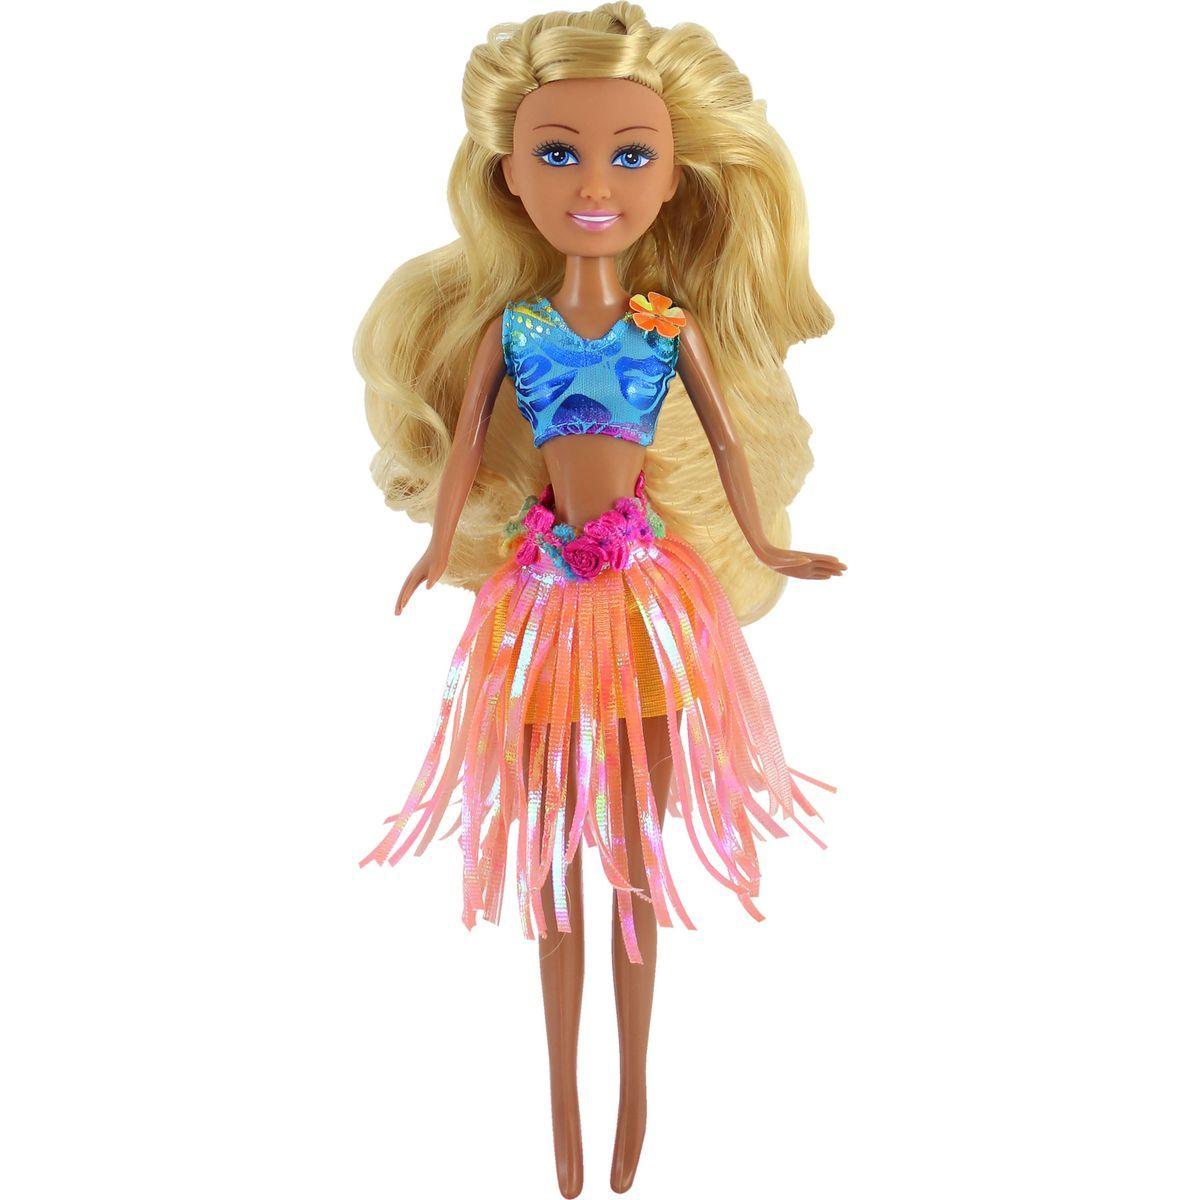 Funville Panenka z Oceanie Sparkle Girlz v kornoutu oranžová sukně